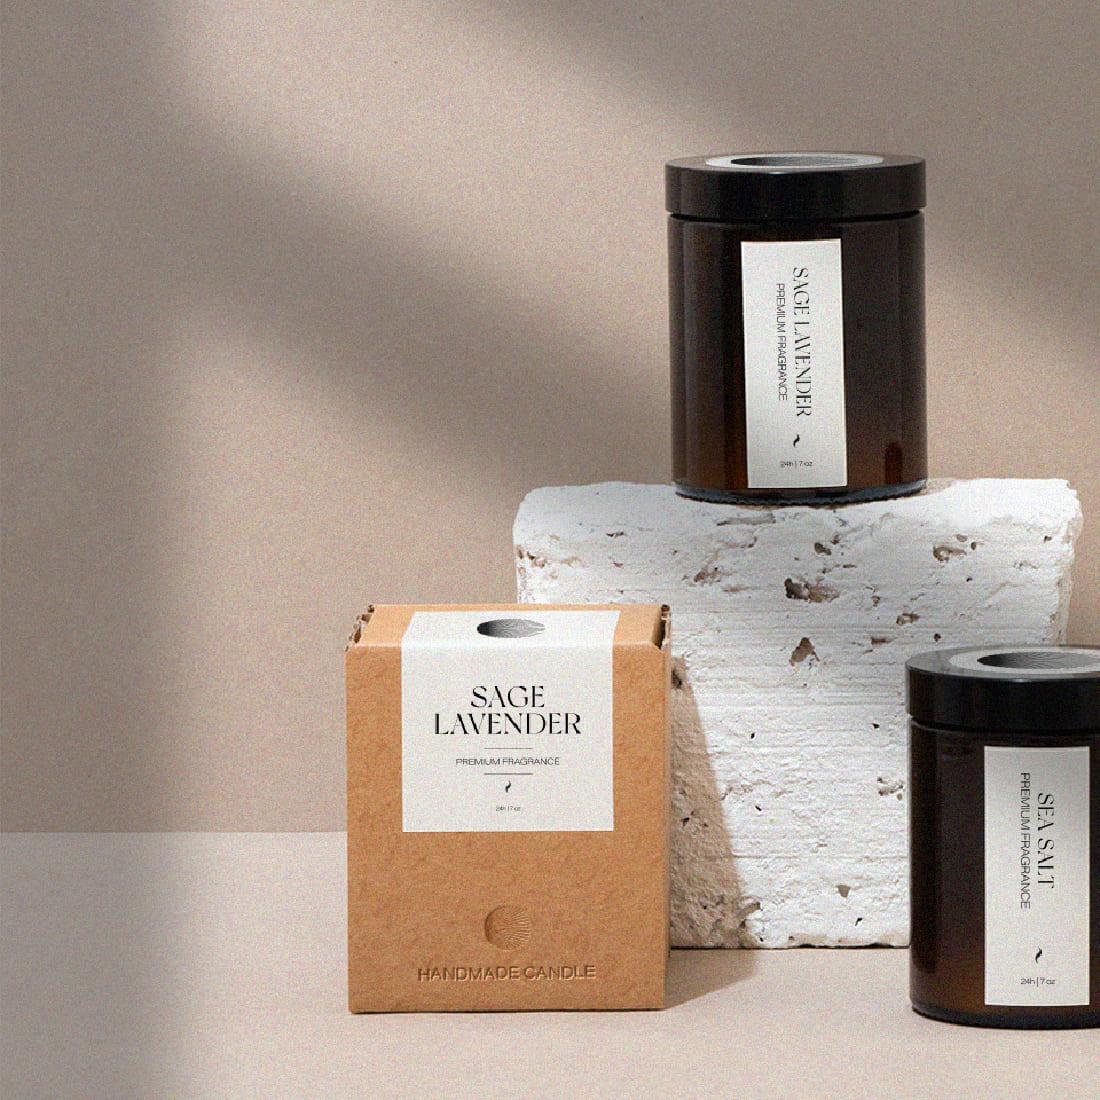 O Sol Cartomancy and Handmade Candles Company